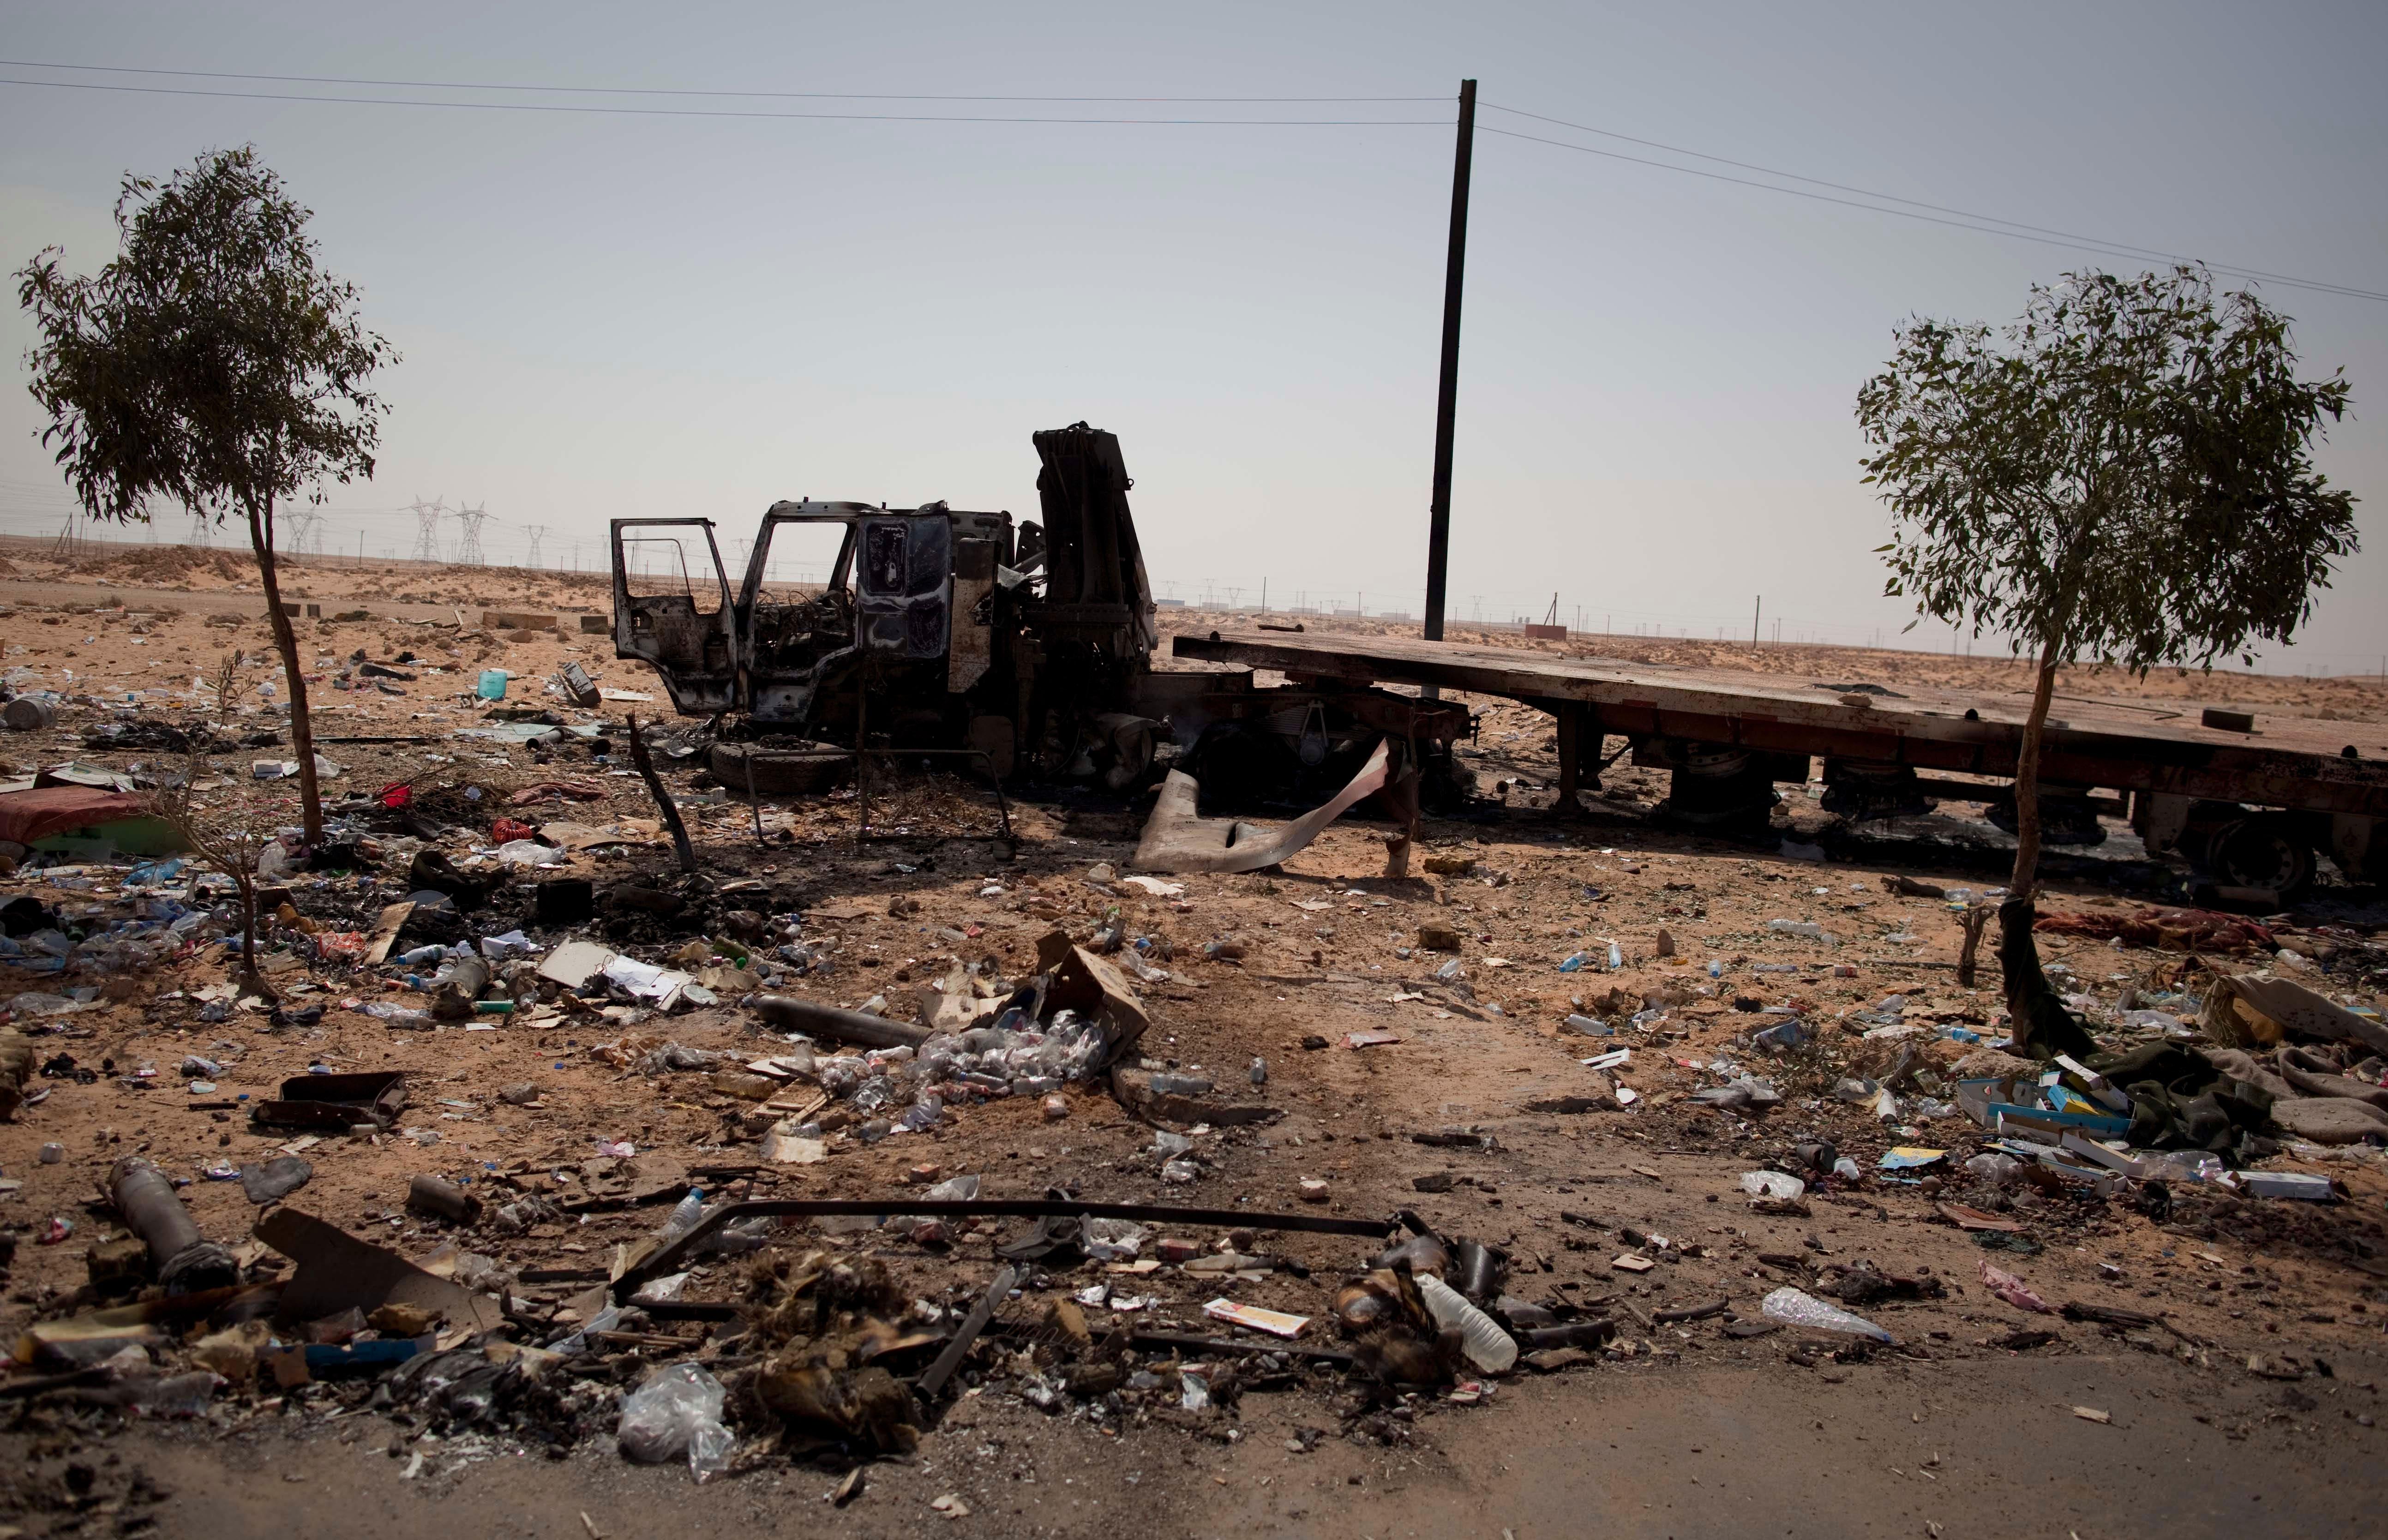 Westlake Legal Group Mideast-Libya_Hers5 Airstrike kills 17 ISIS terrorists in Libya: US military Melissa Leon Lucas Tomlinson fox-news/world/world-regions/africa fox-news/world/terrorism/isis fox-news/world/terrorism fox-news/us/military fox news fnc/us fnc article a05476c6-aaa2-54ae-aef4-064abda173b2